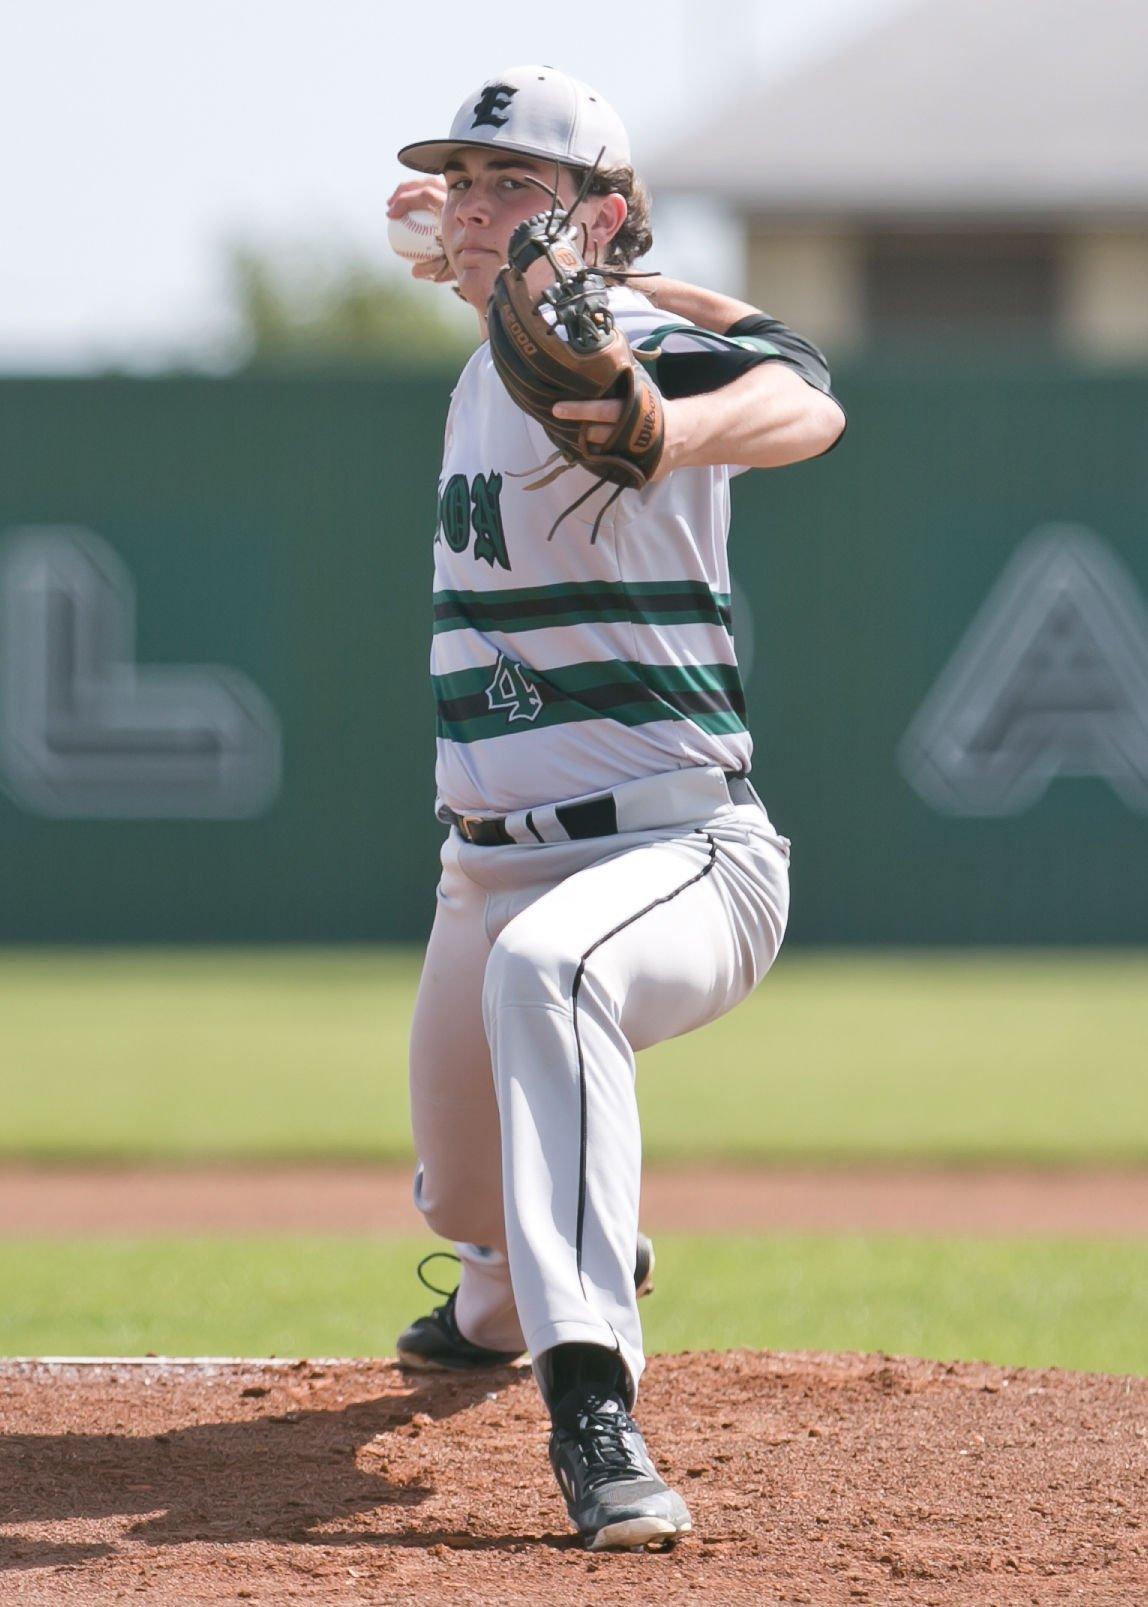 Shoemaker at Ellison Baseball